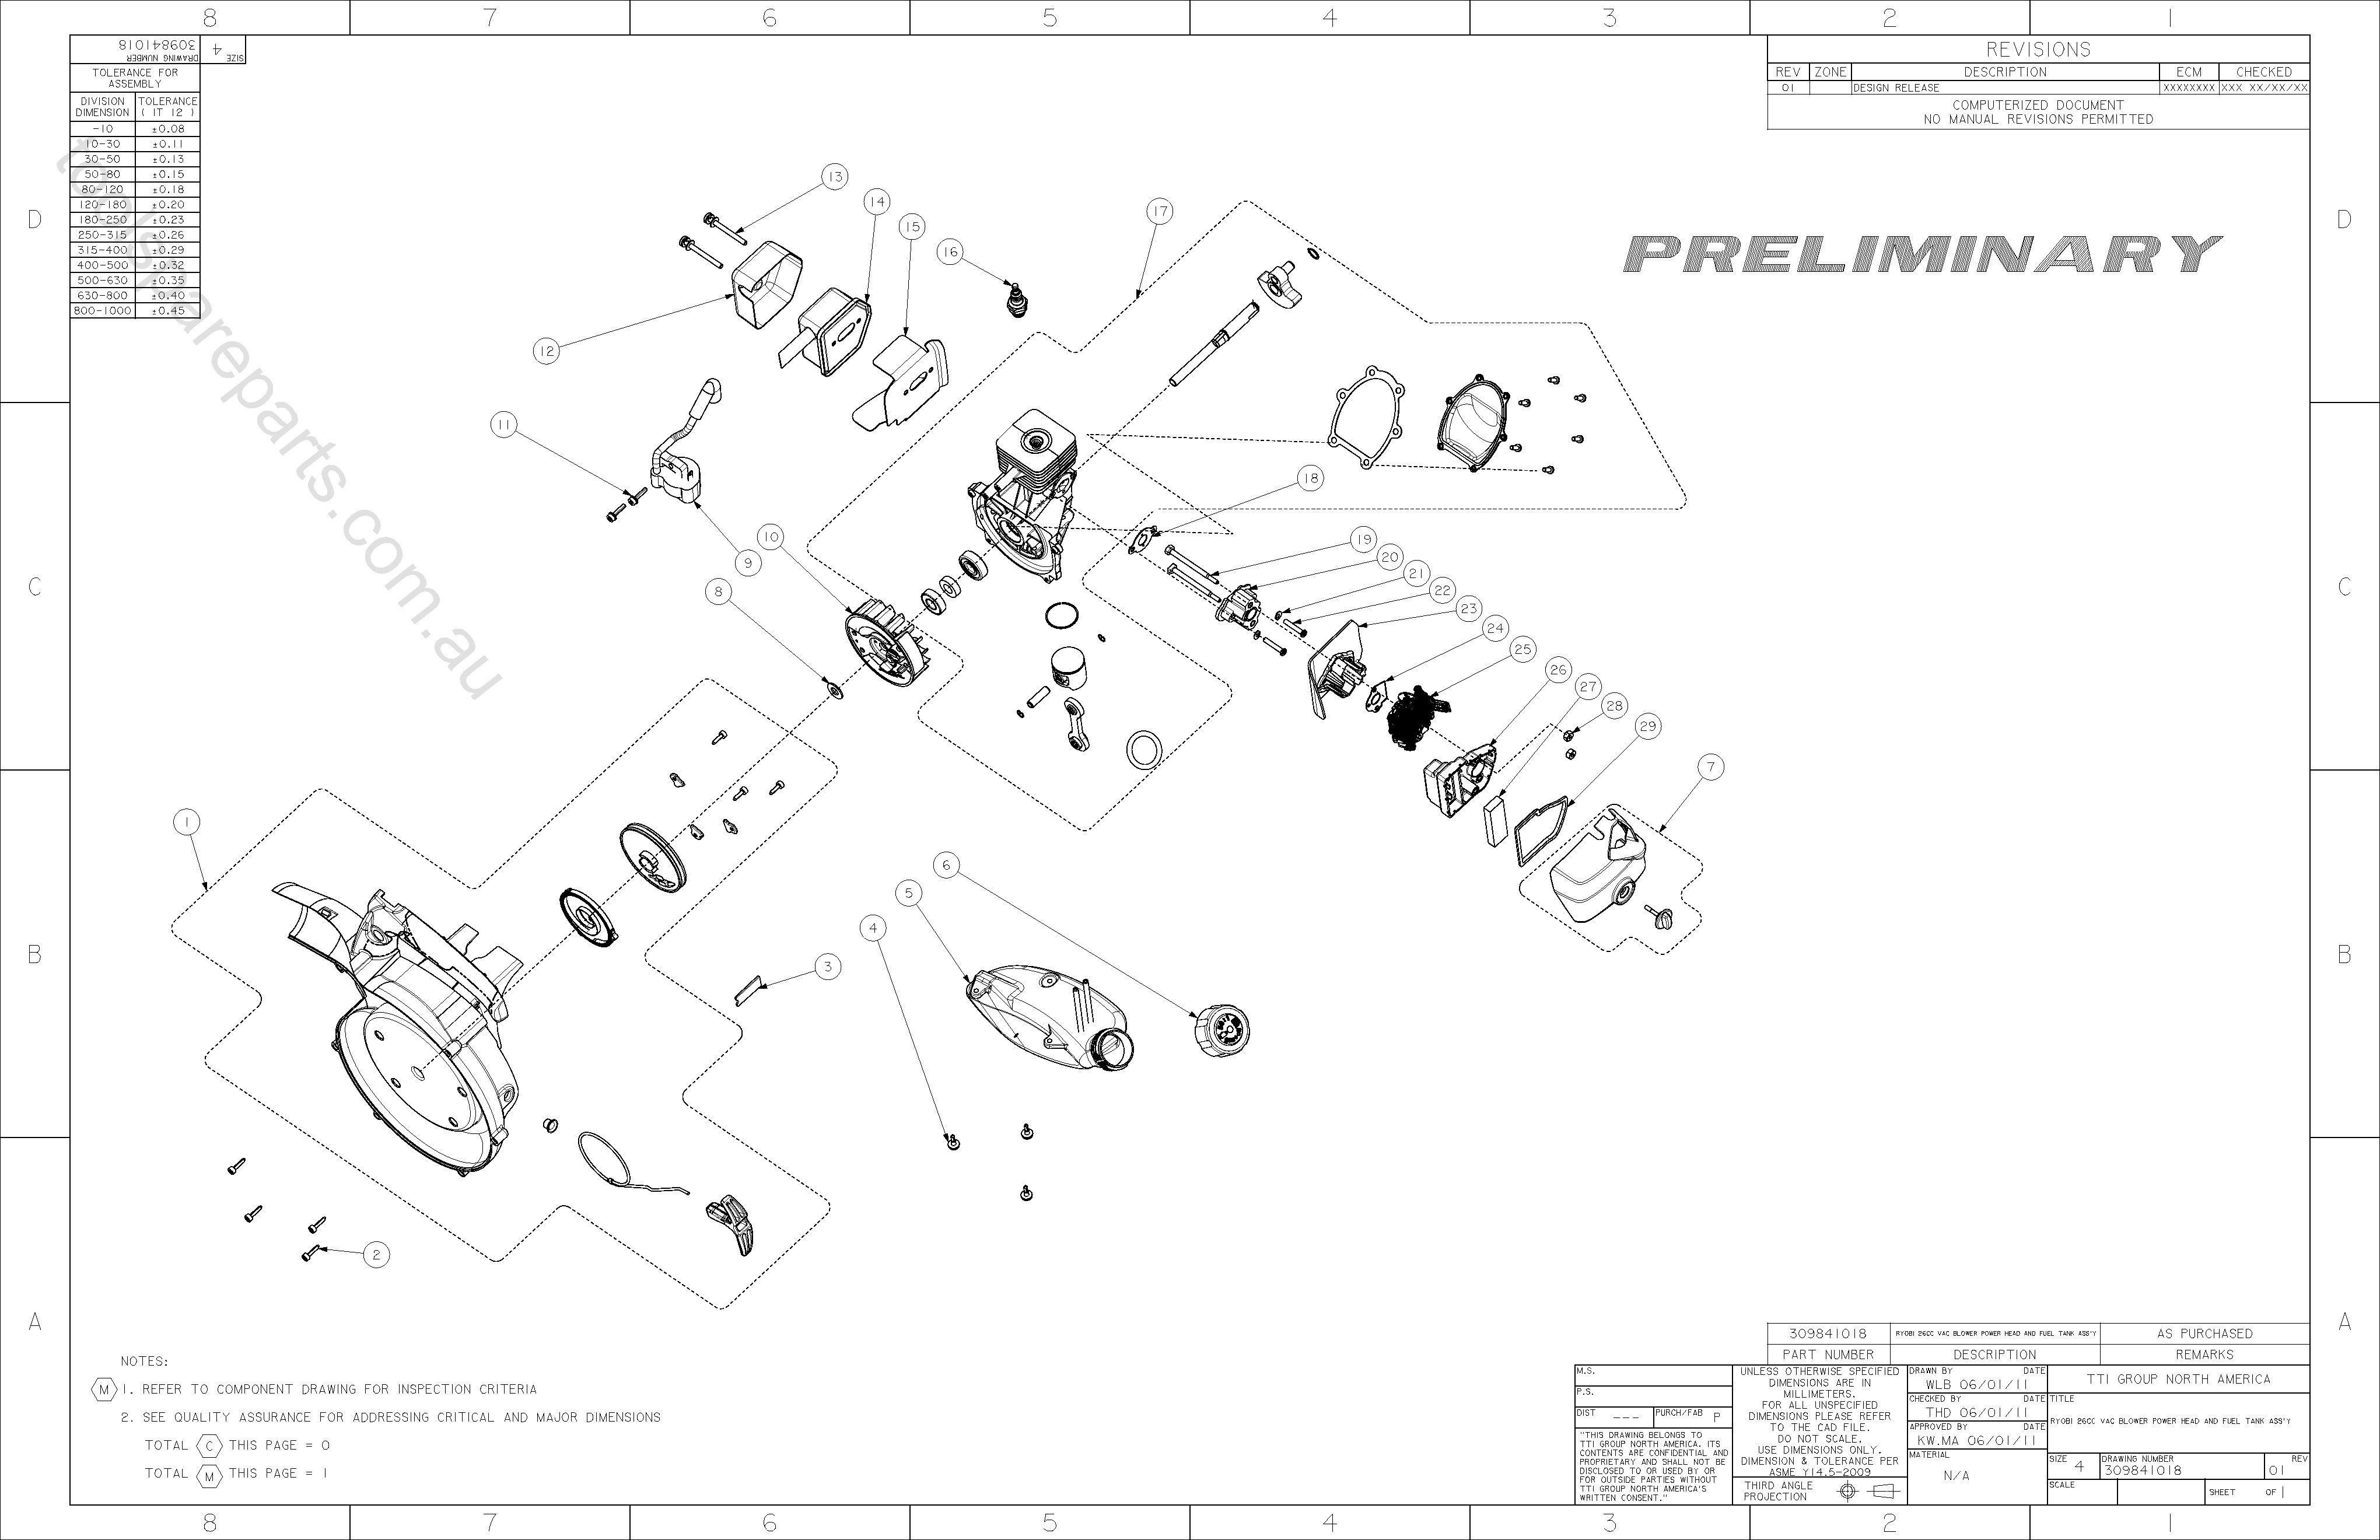 ryobi engine diagram unique ryobi generator wiring diagram diagram  ryobi  generation  unique ryobi generator wiring diagram